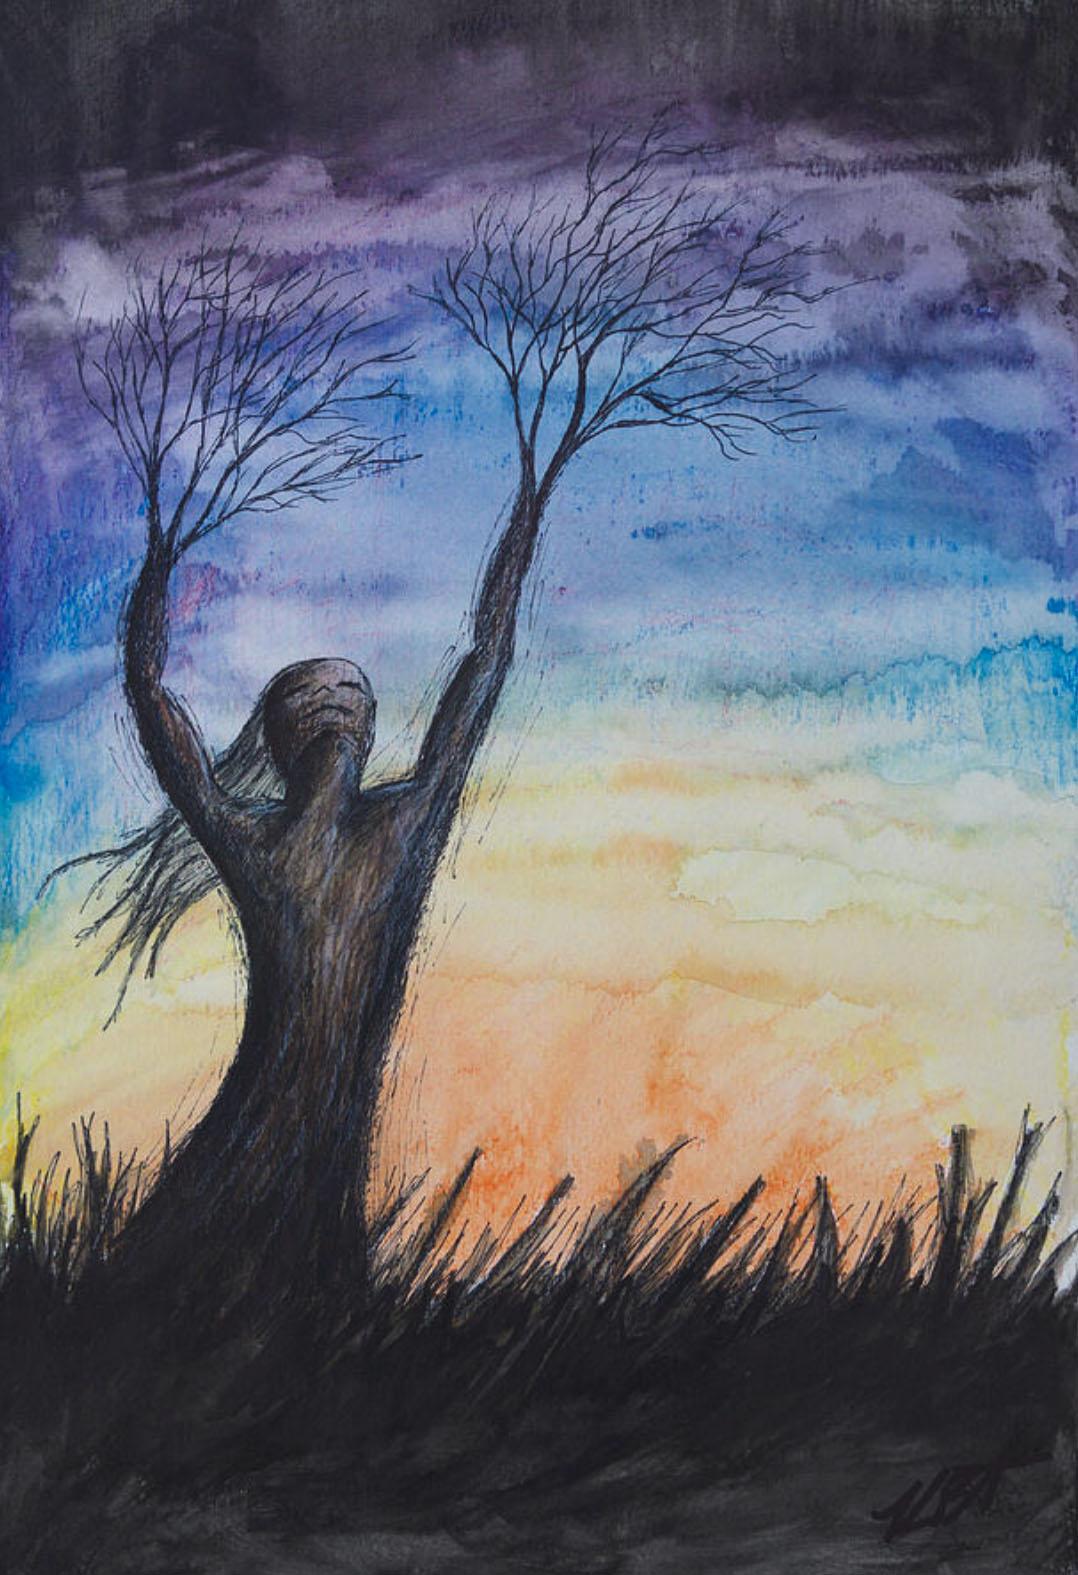 KrystaBernhardt_Zephyr_tree_person_sunset_watercolor_ink.jpg